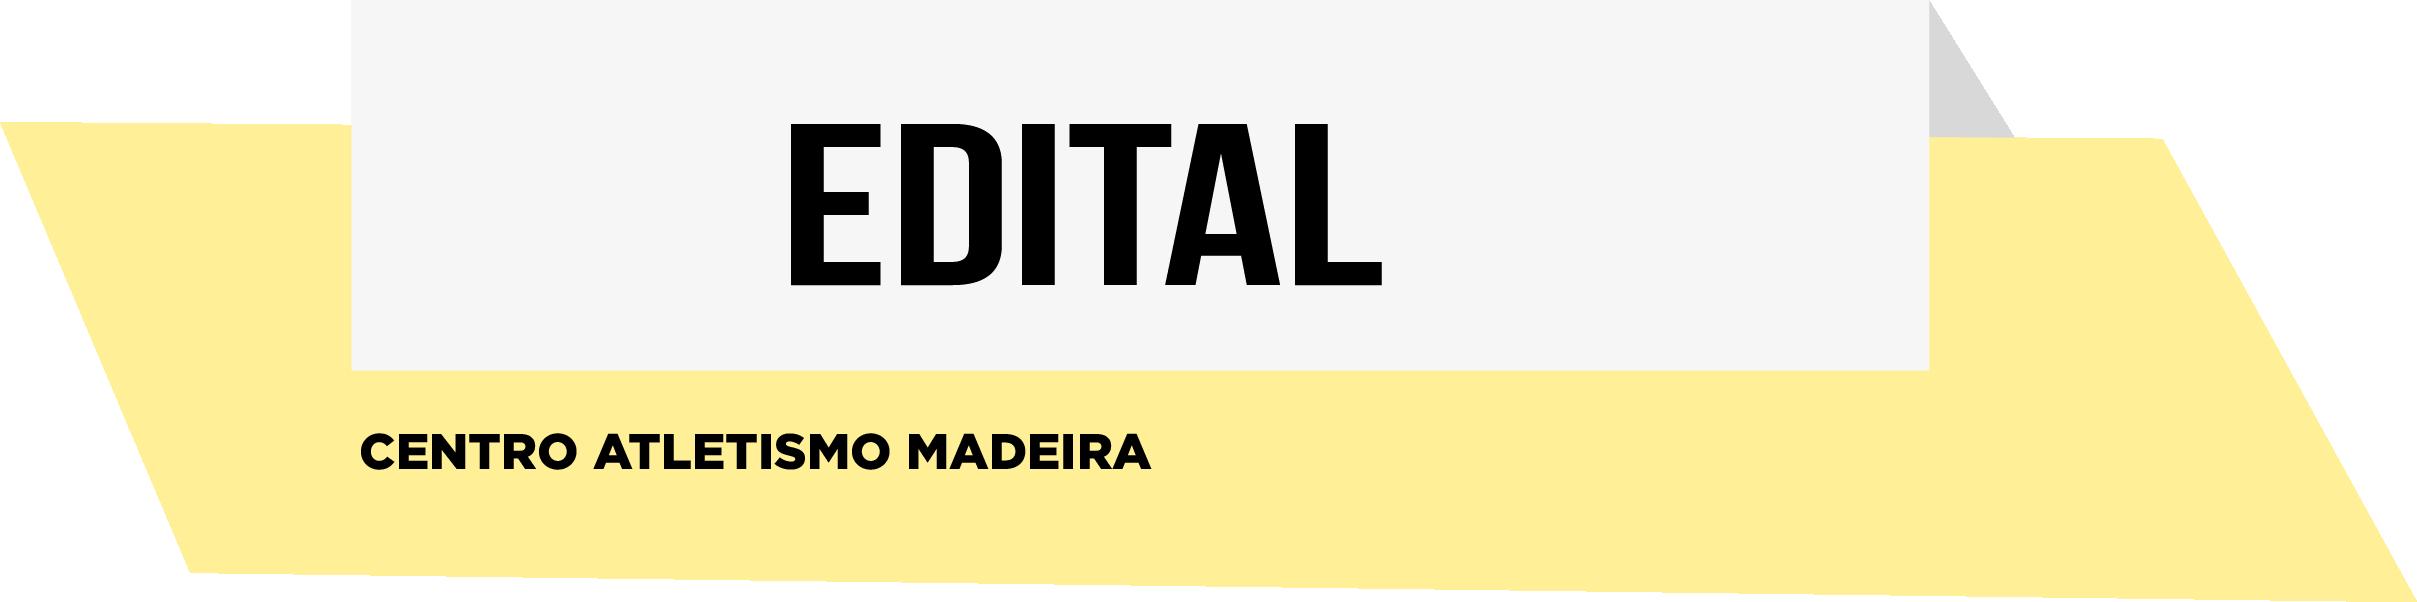 EDITAL- Centro Atletismo Madeira